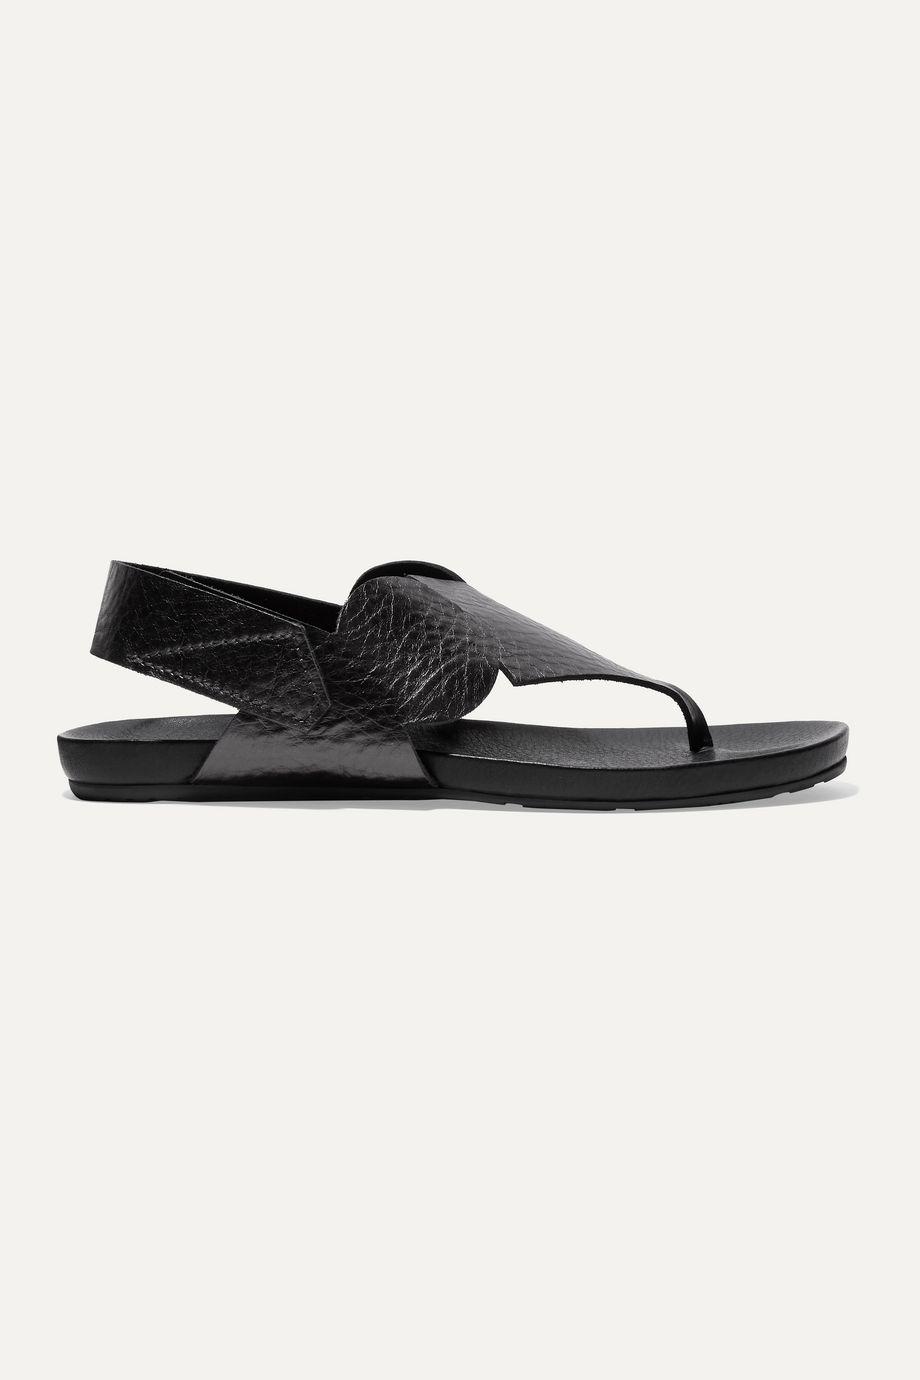 Pedro Garcia Josefa metallic textured-leather slingback sandals